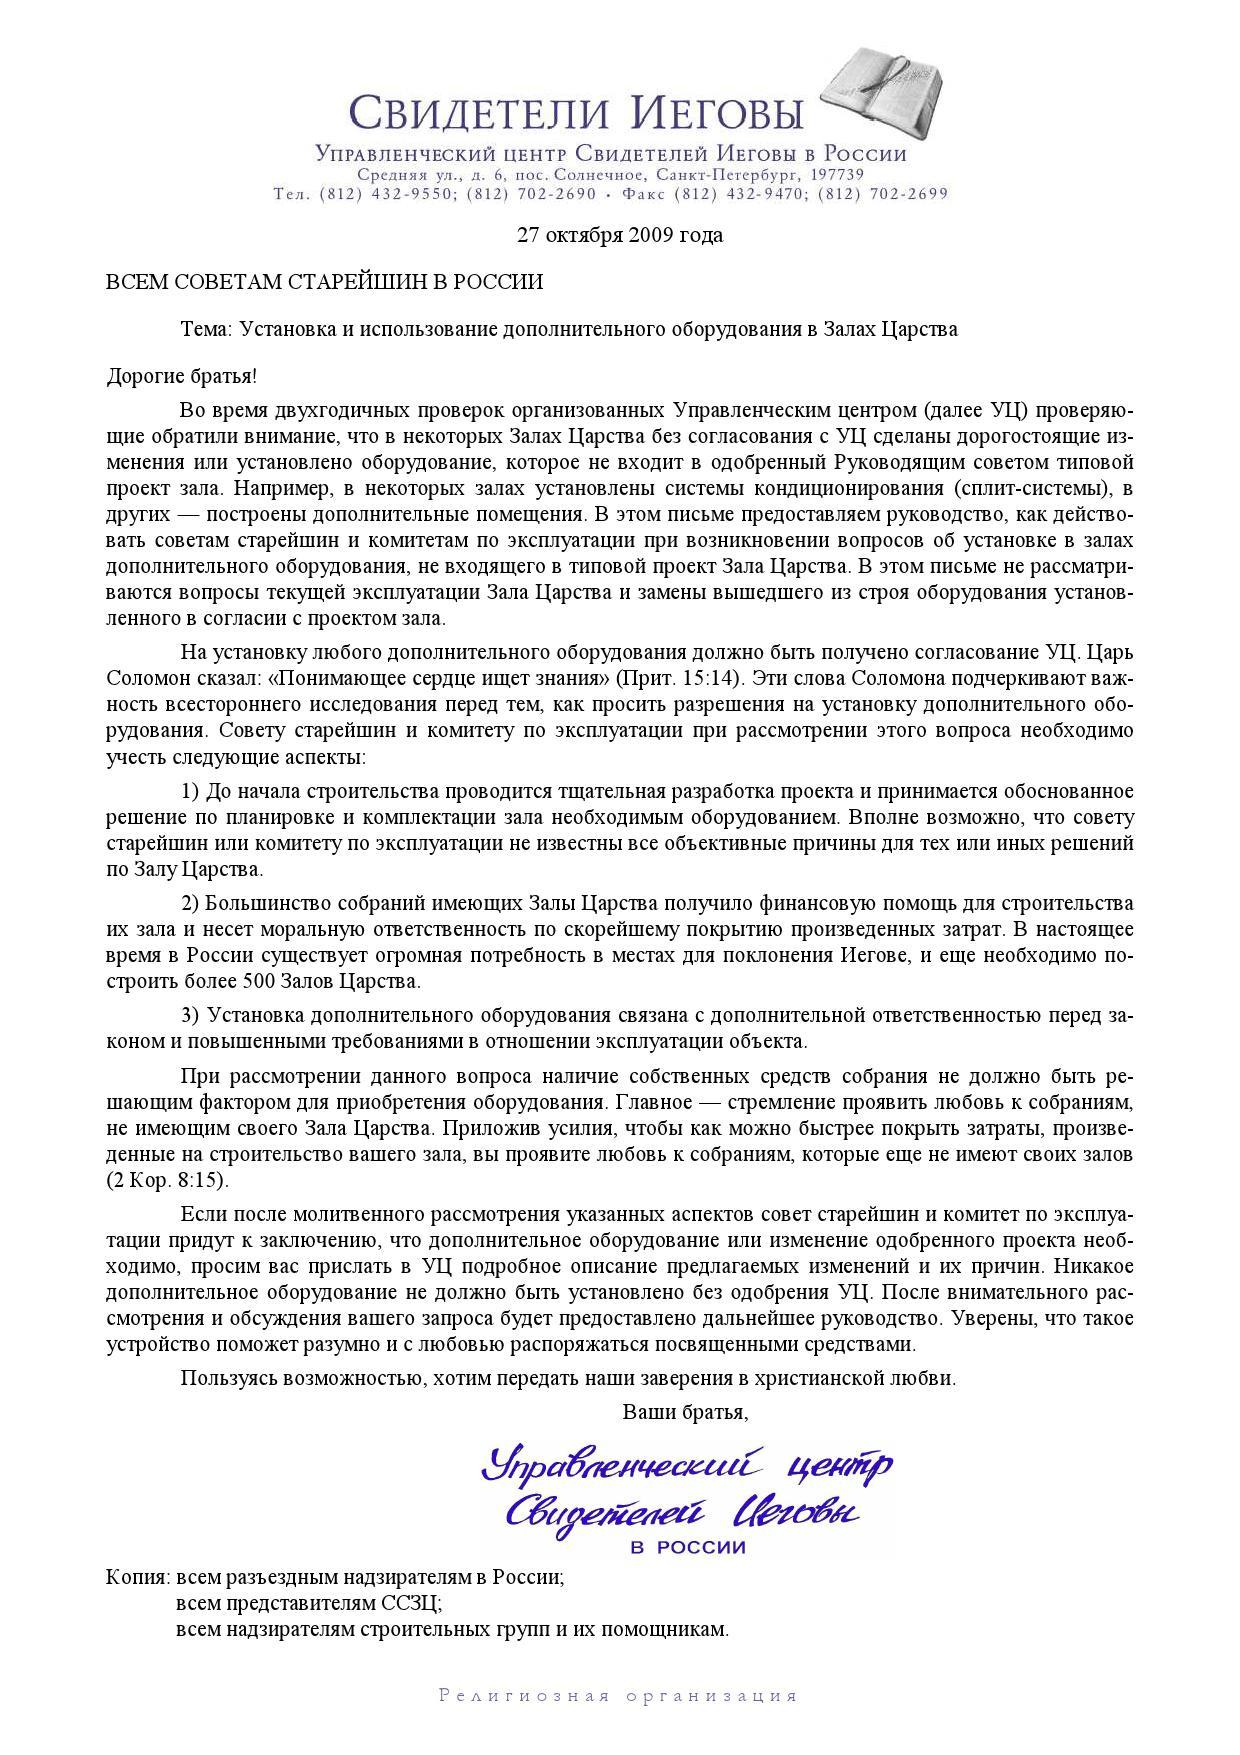 L-20091027-U-Ru-BOE (о доп. оборудовании в ЗЦ и возврате денег на строит)_000001